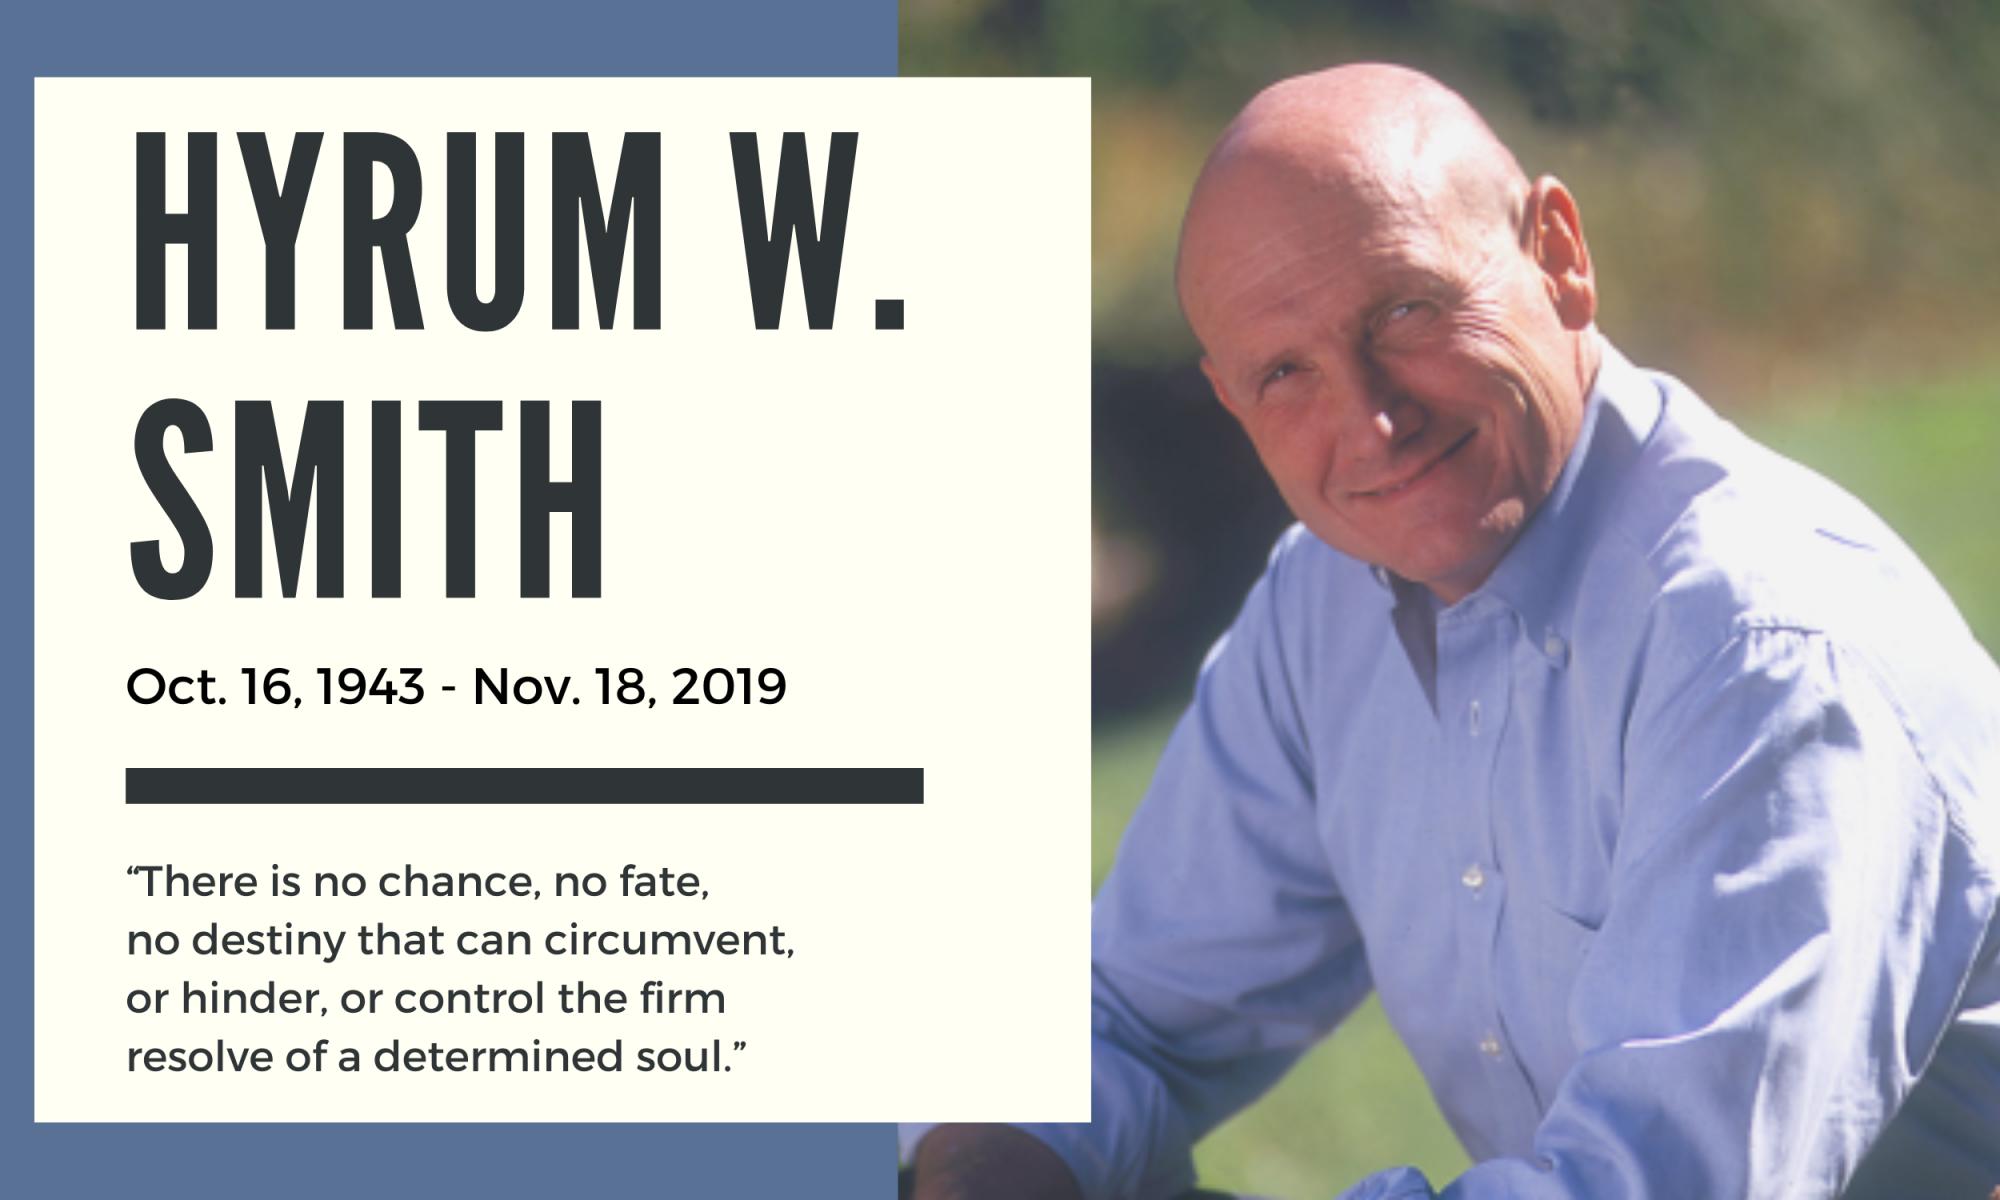 Hyrum W. Smith October 16, 1943 to November 18, 2019